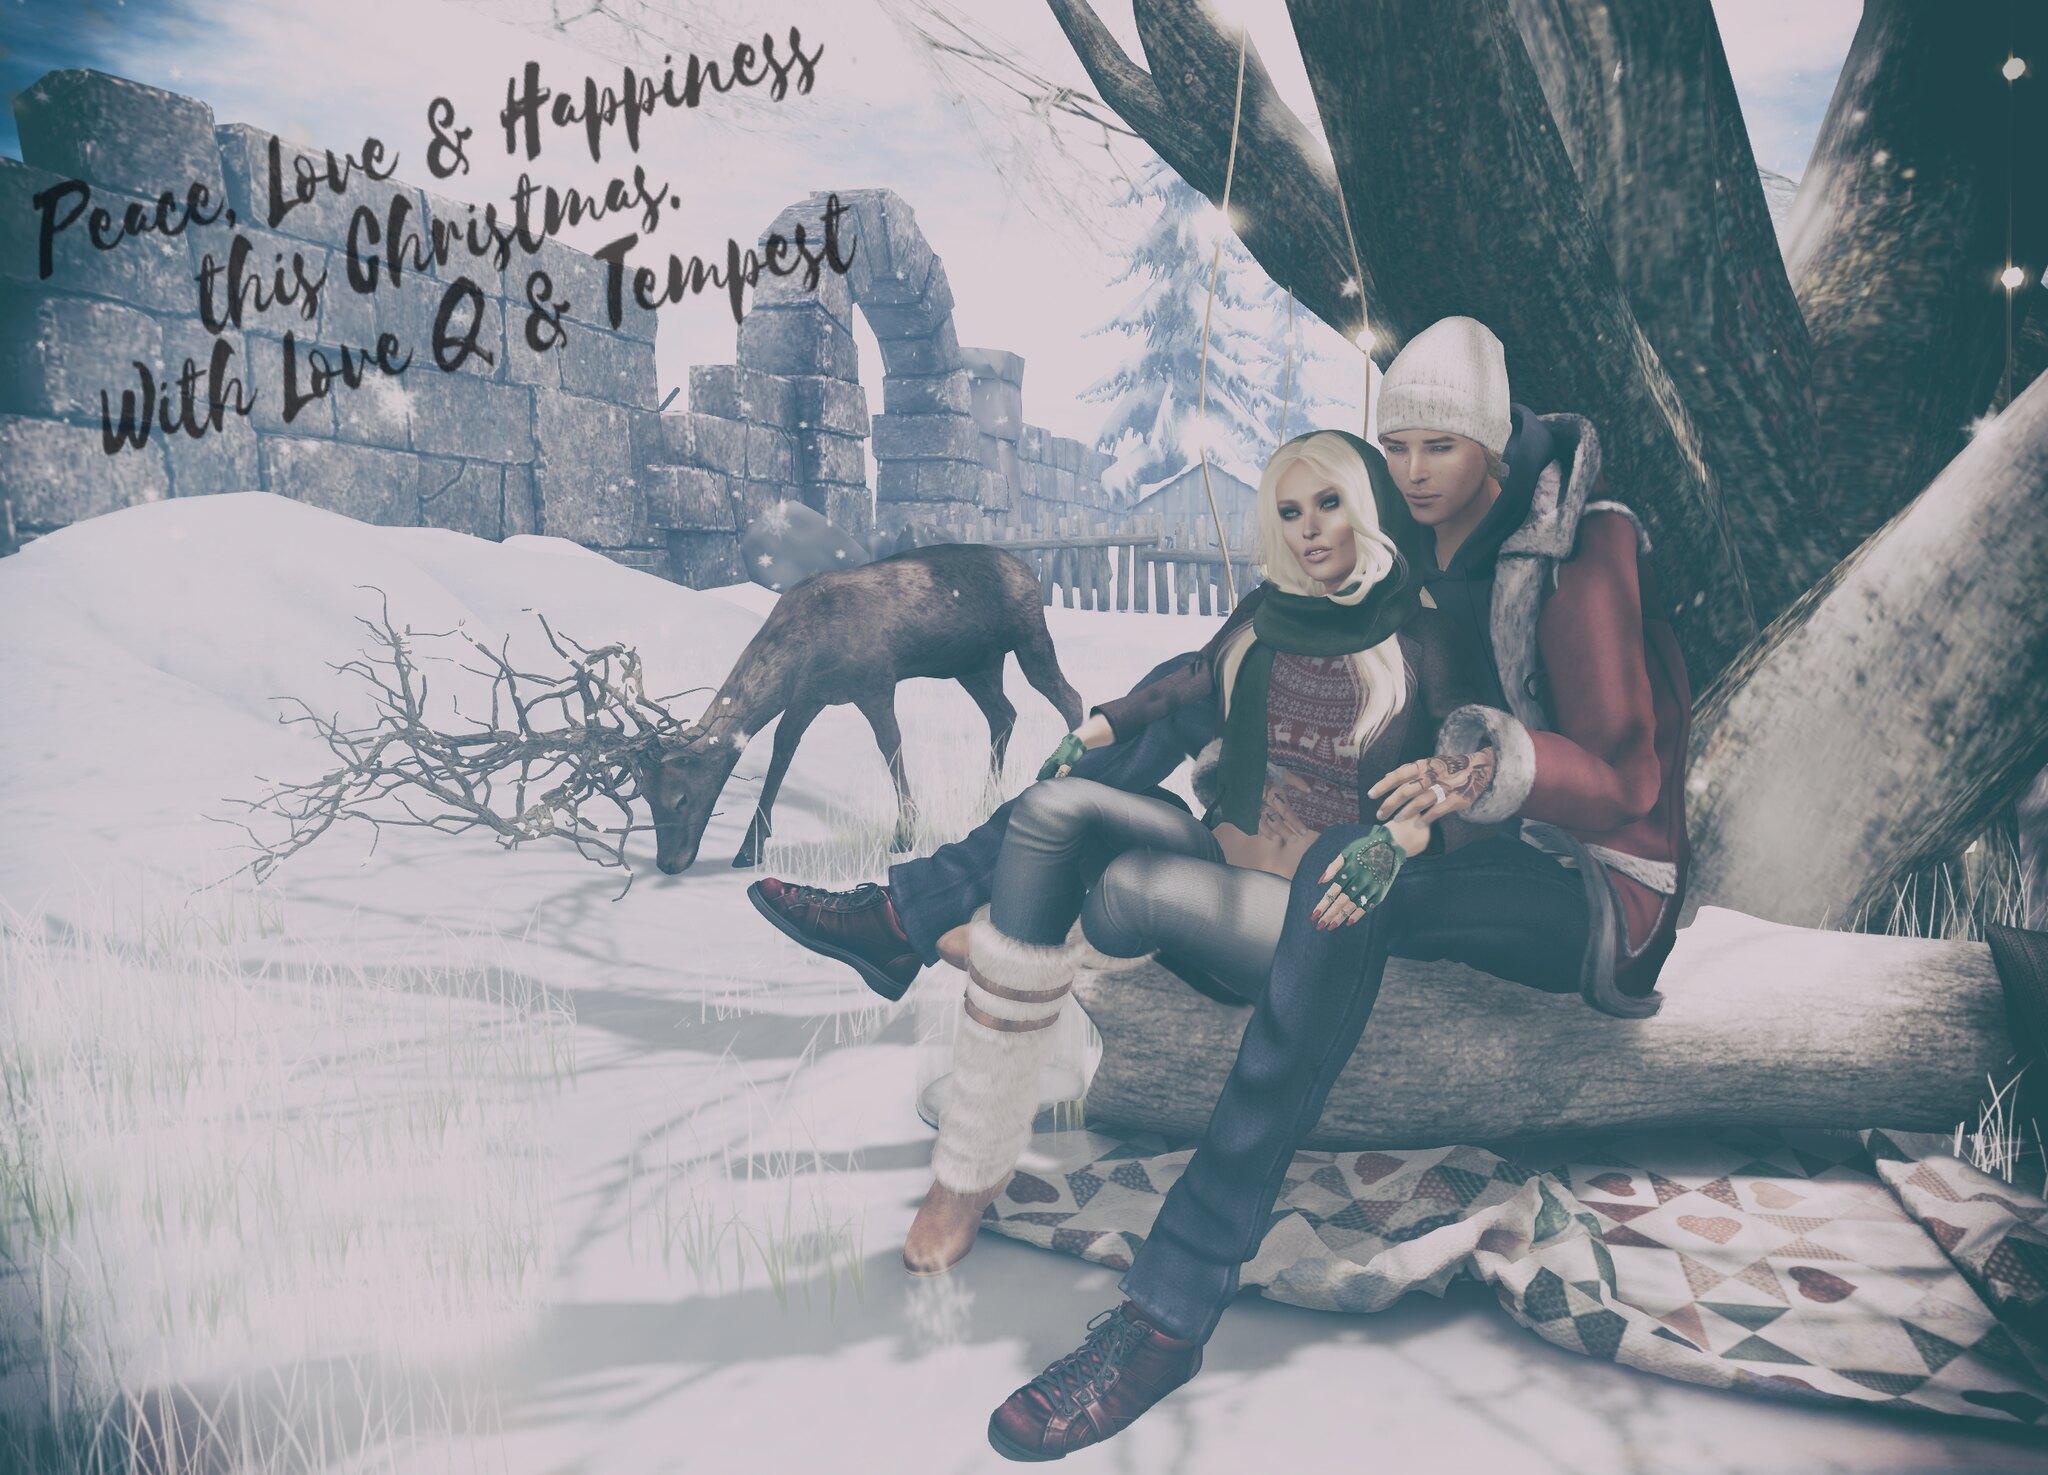 ♥♥ Happy Christmas ♥♥